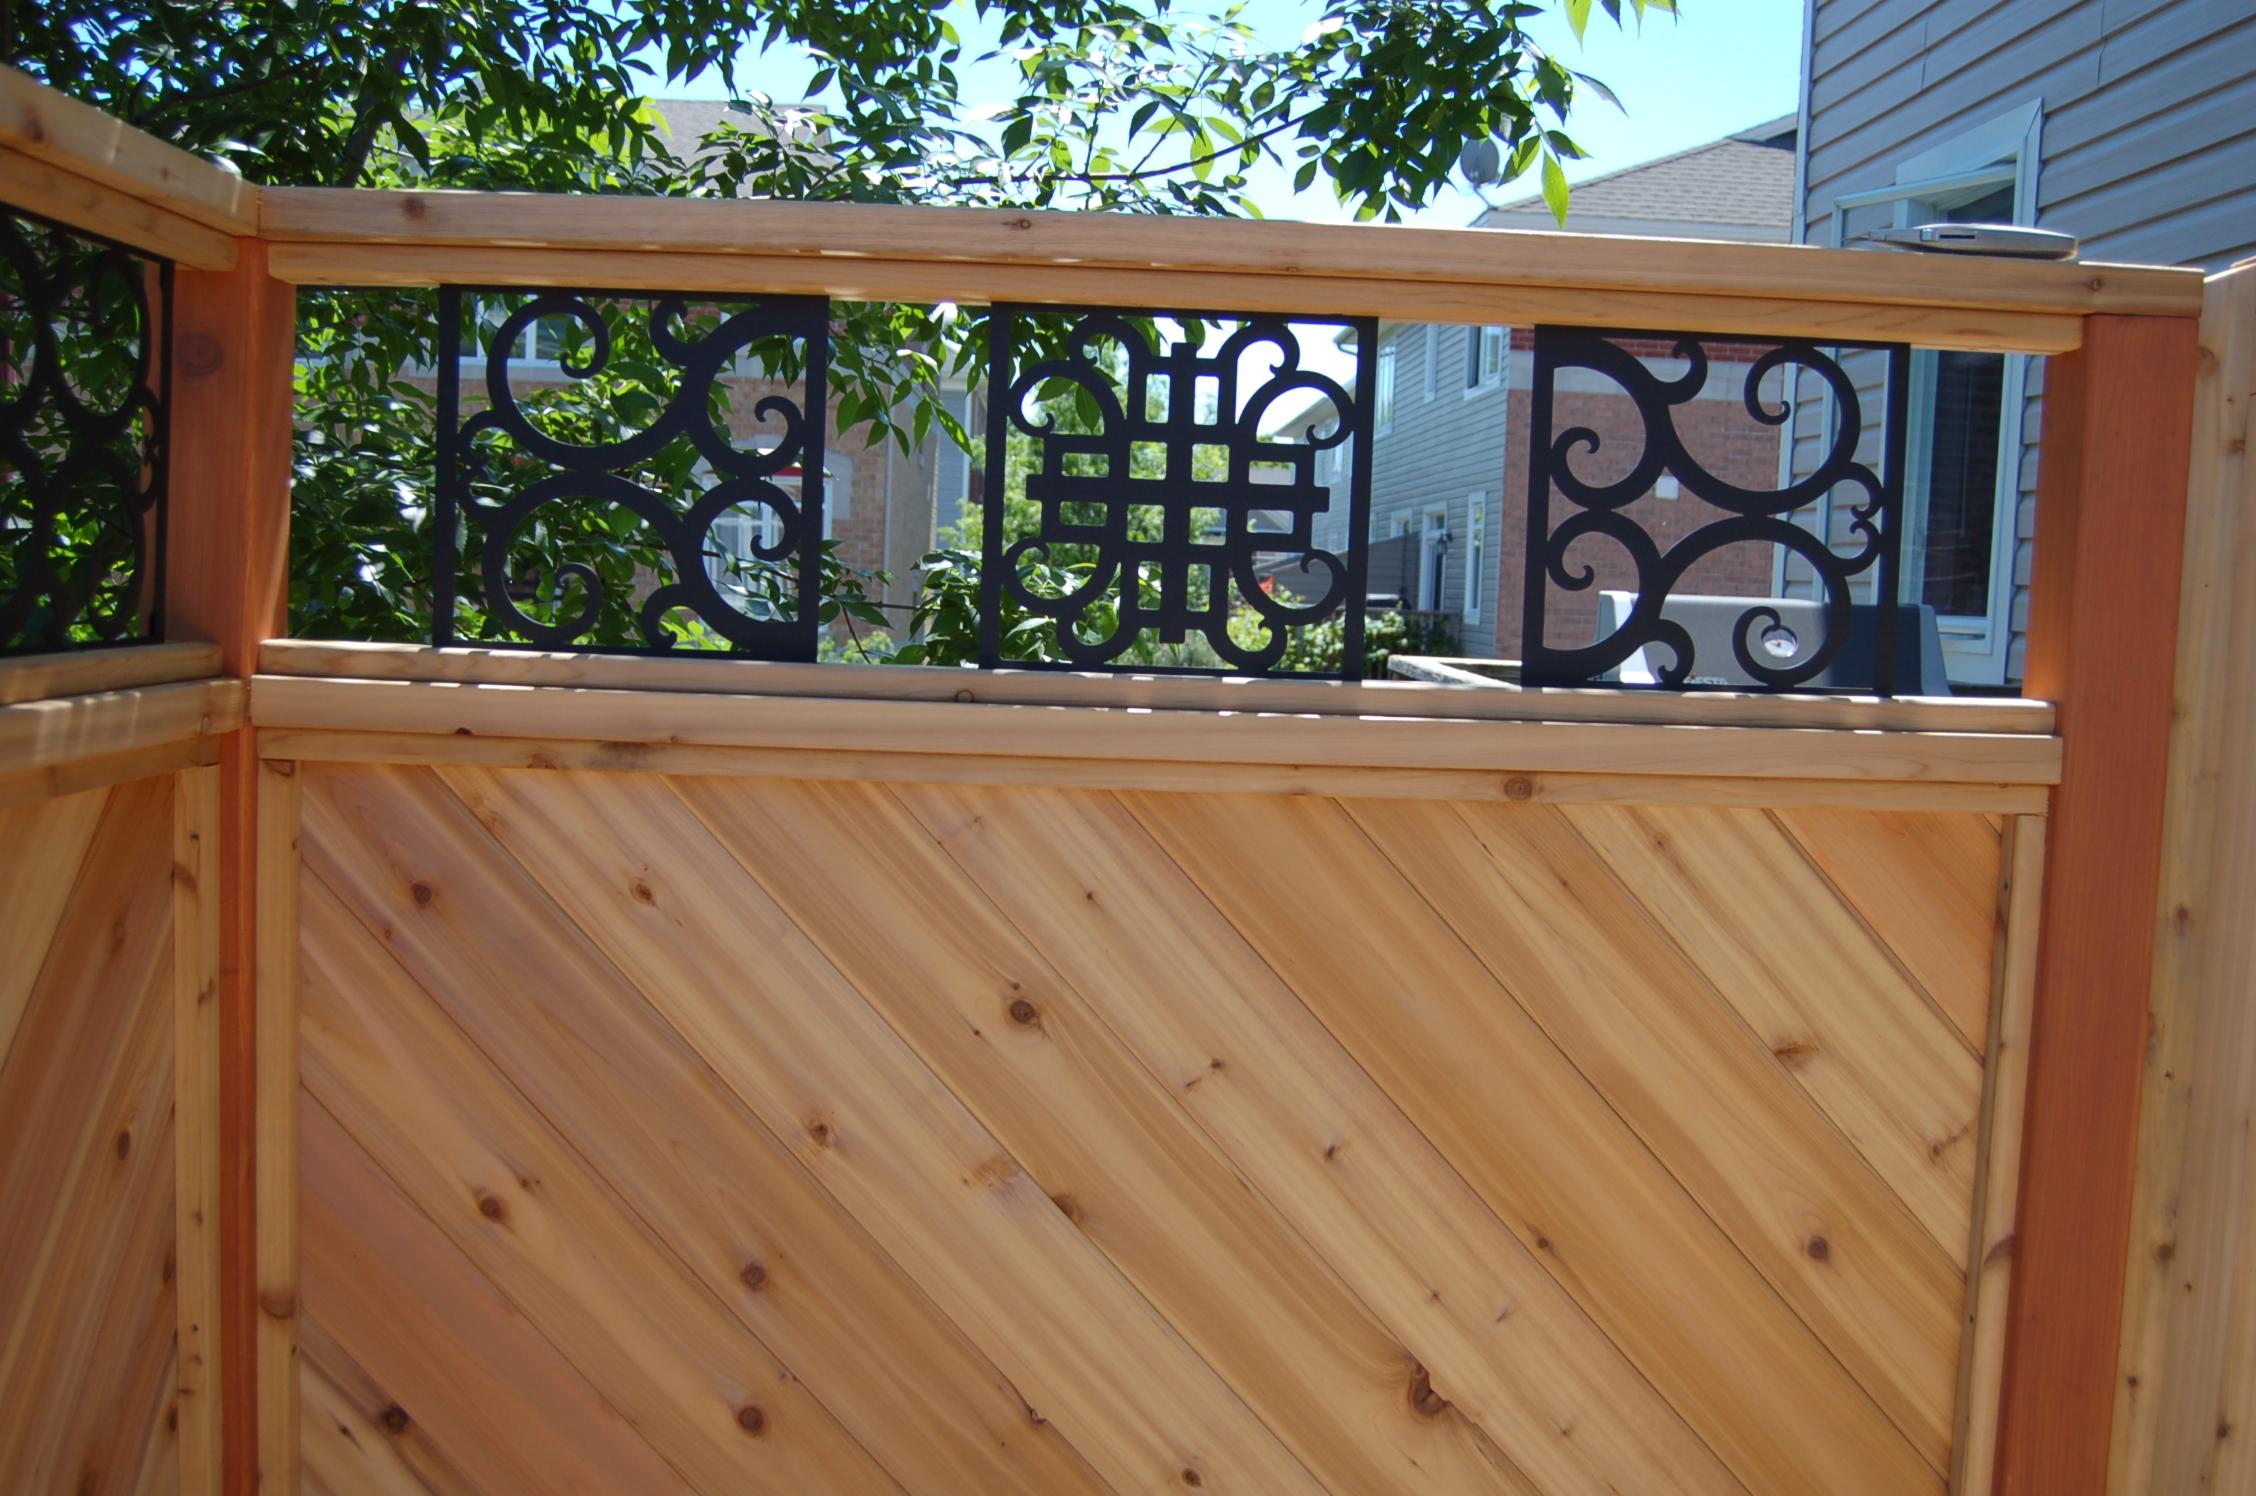 T & G Cedar and Wrought Iron Art